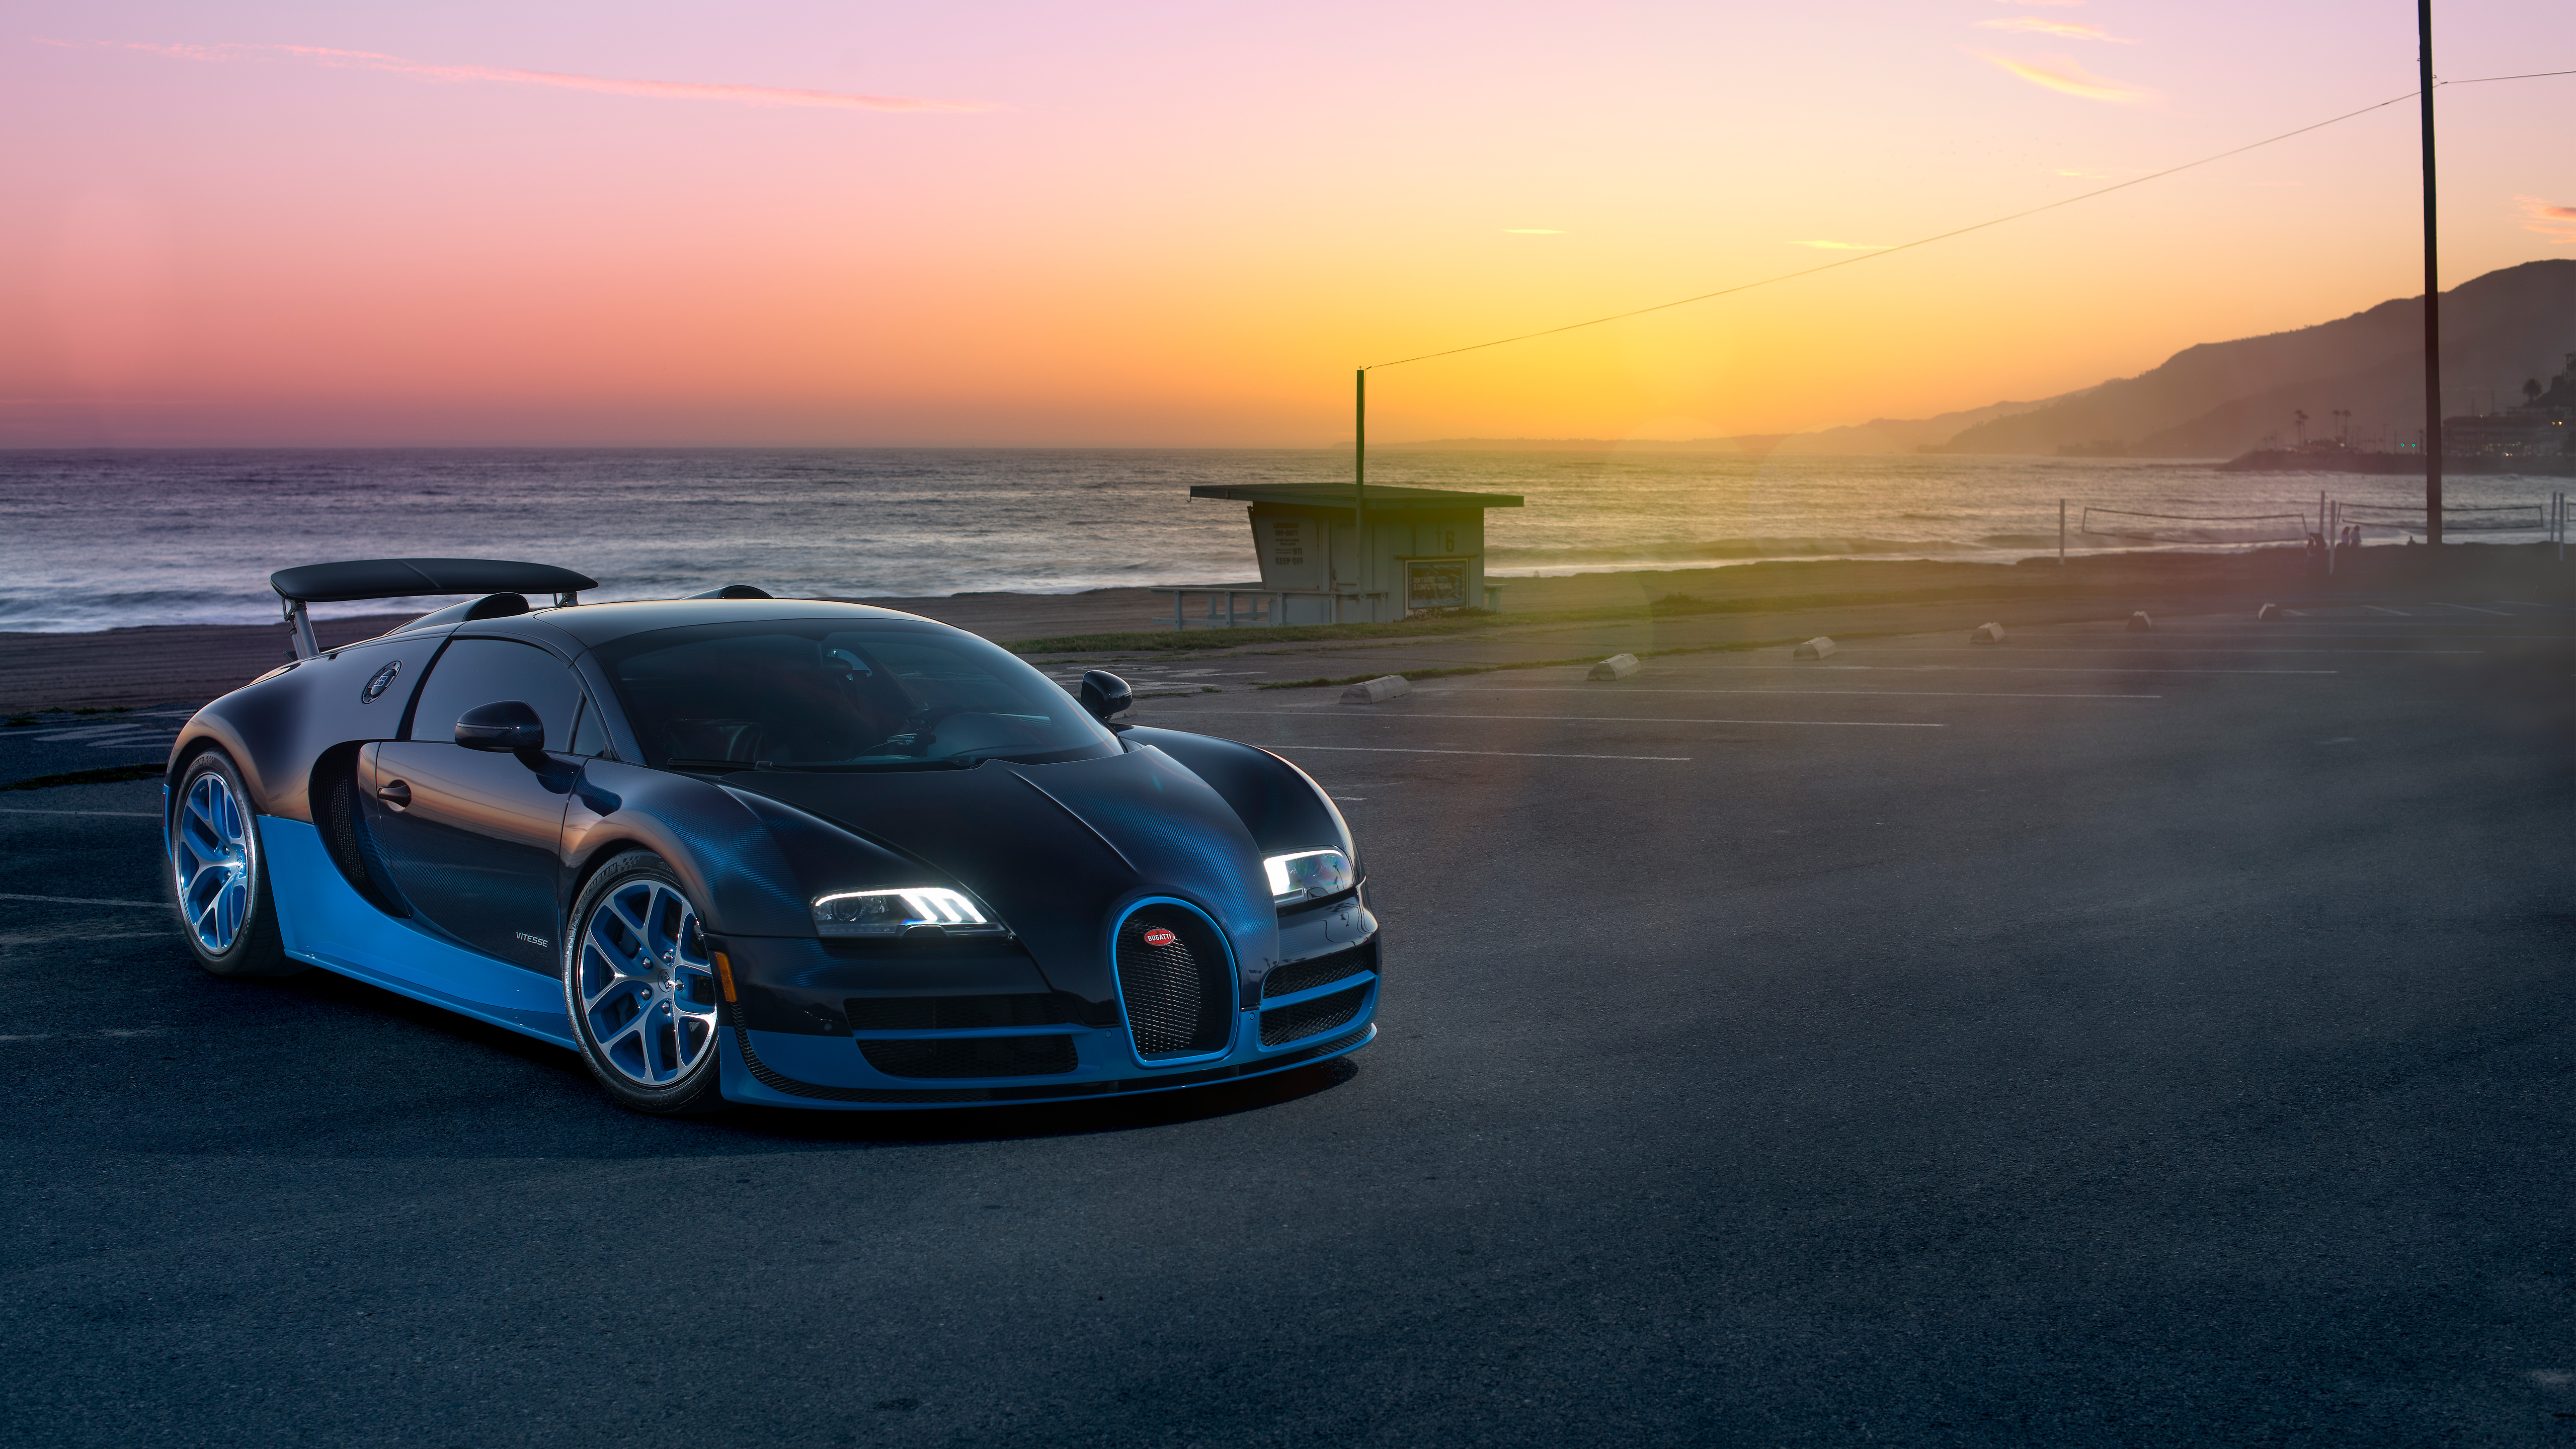 bugatti veyron grand sport vitesse 5k wallpaper hd car wallpapers. Black Bedroom Furniture Sets. Home Design Ideas